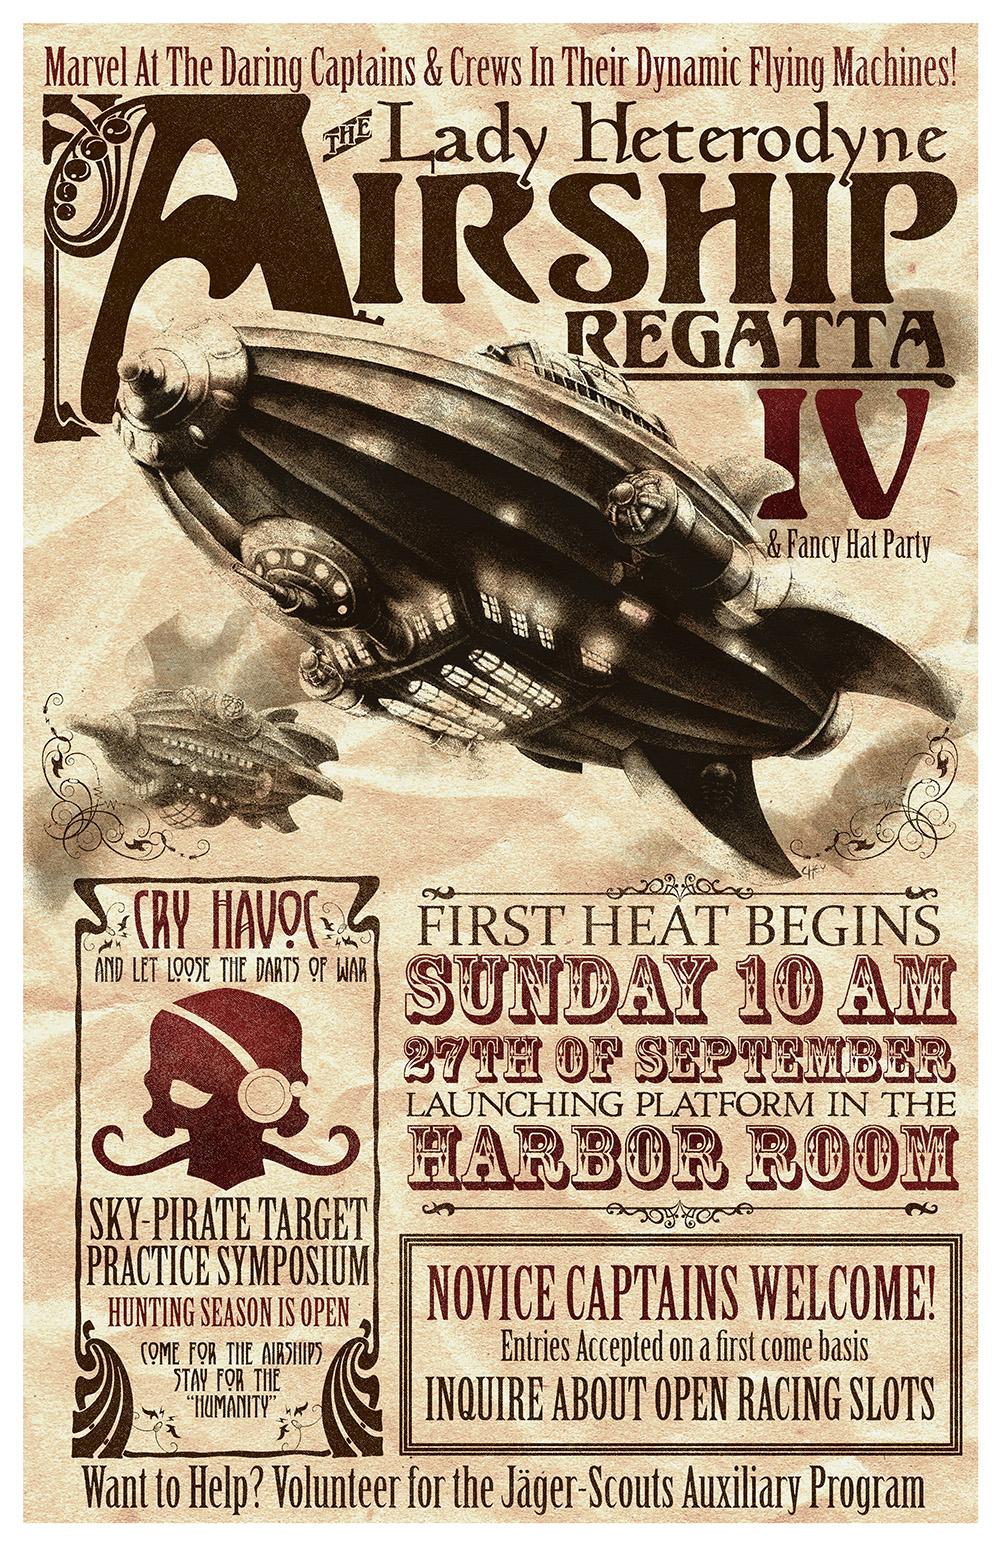 Regatta2015